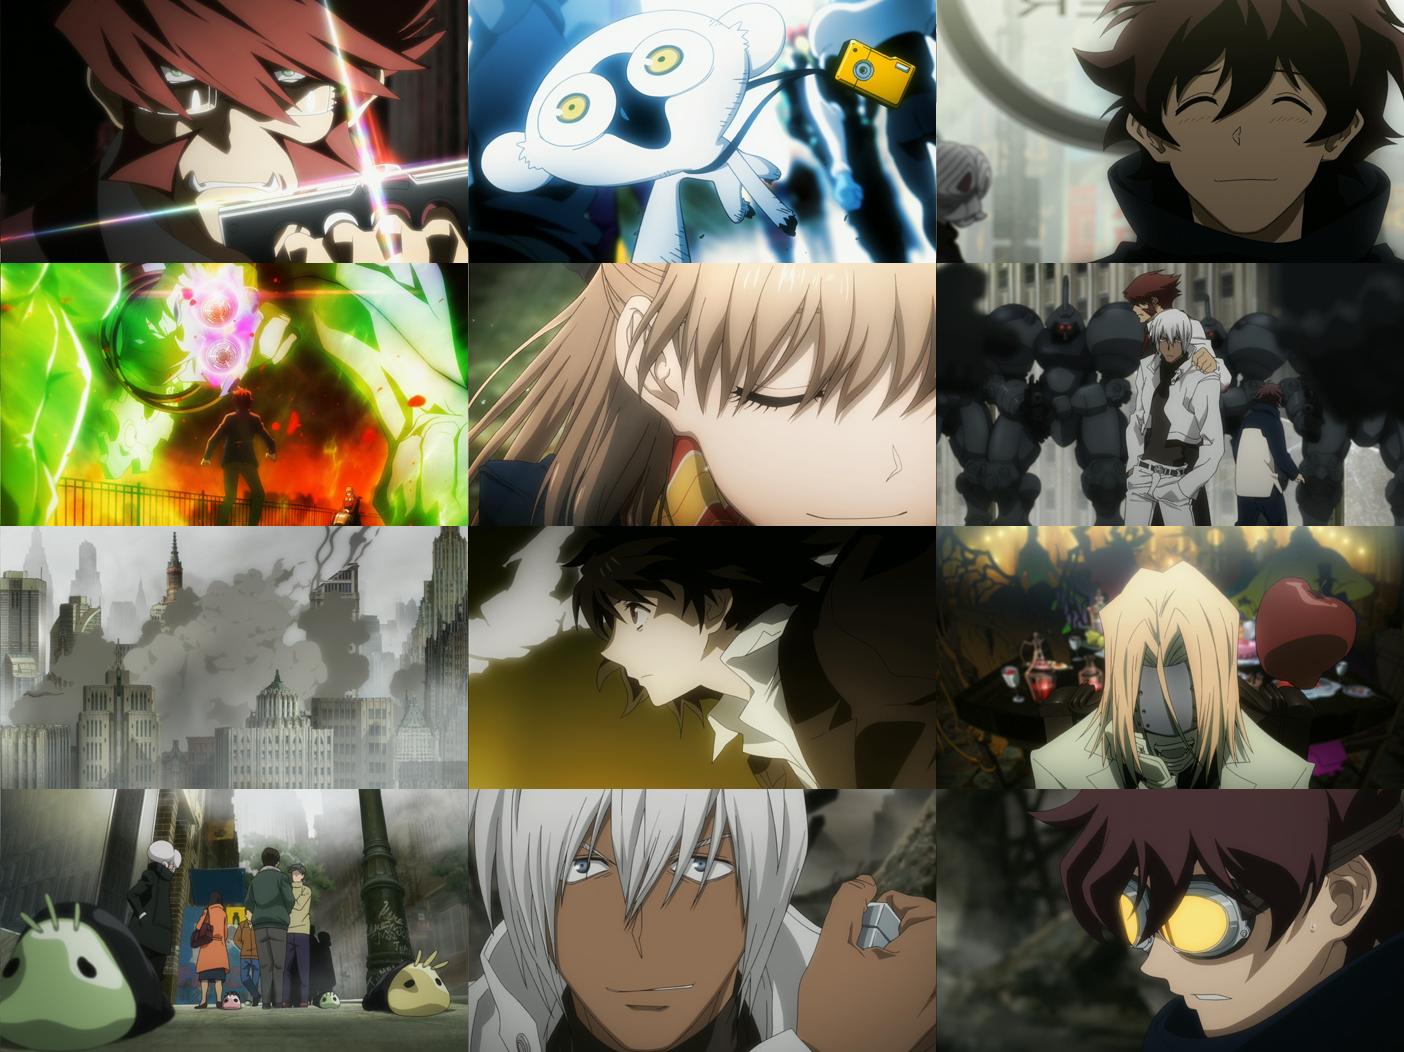 Archivo:Episode 01.png